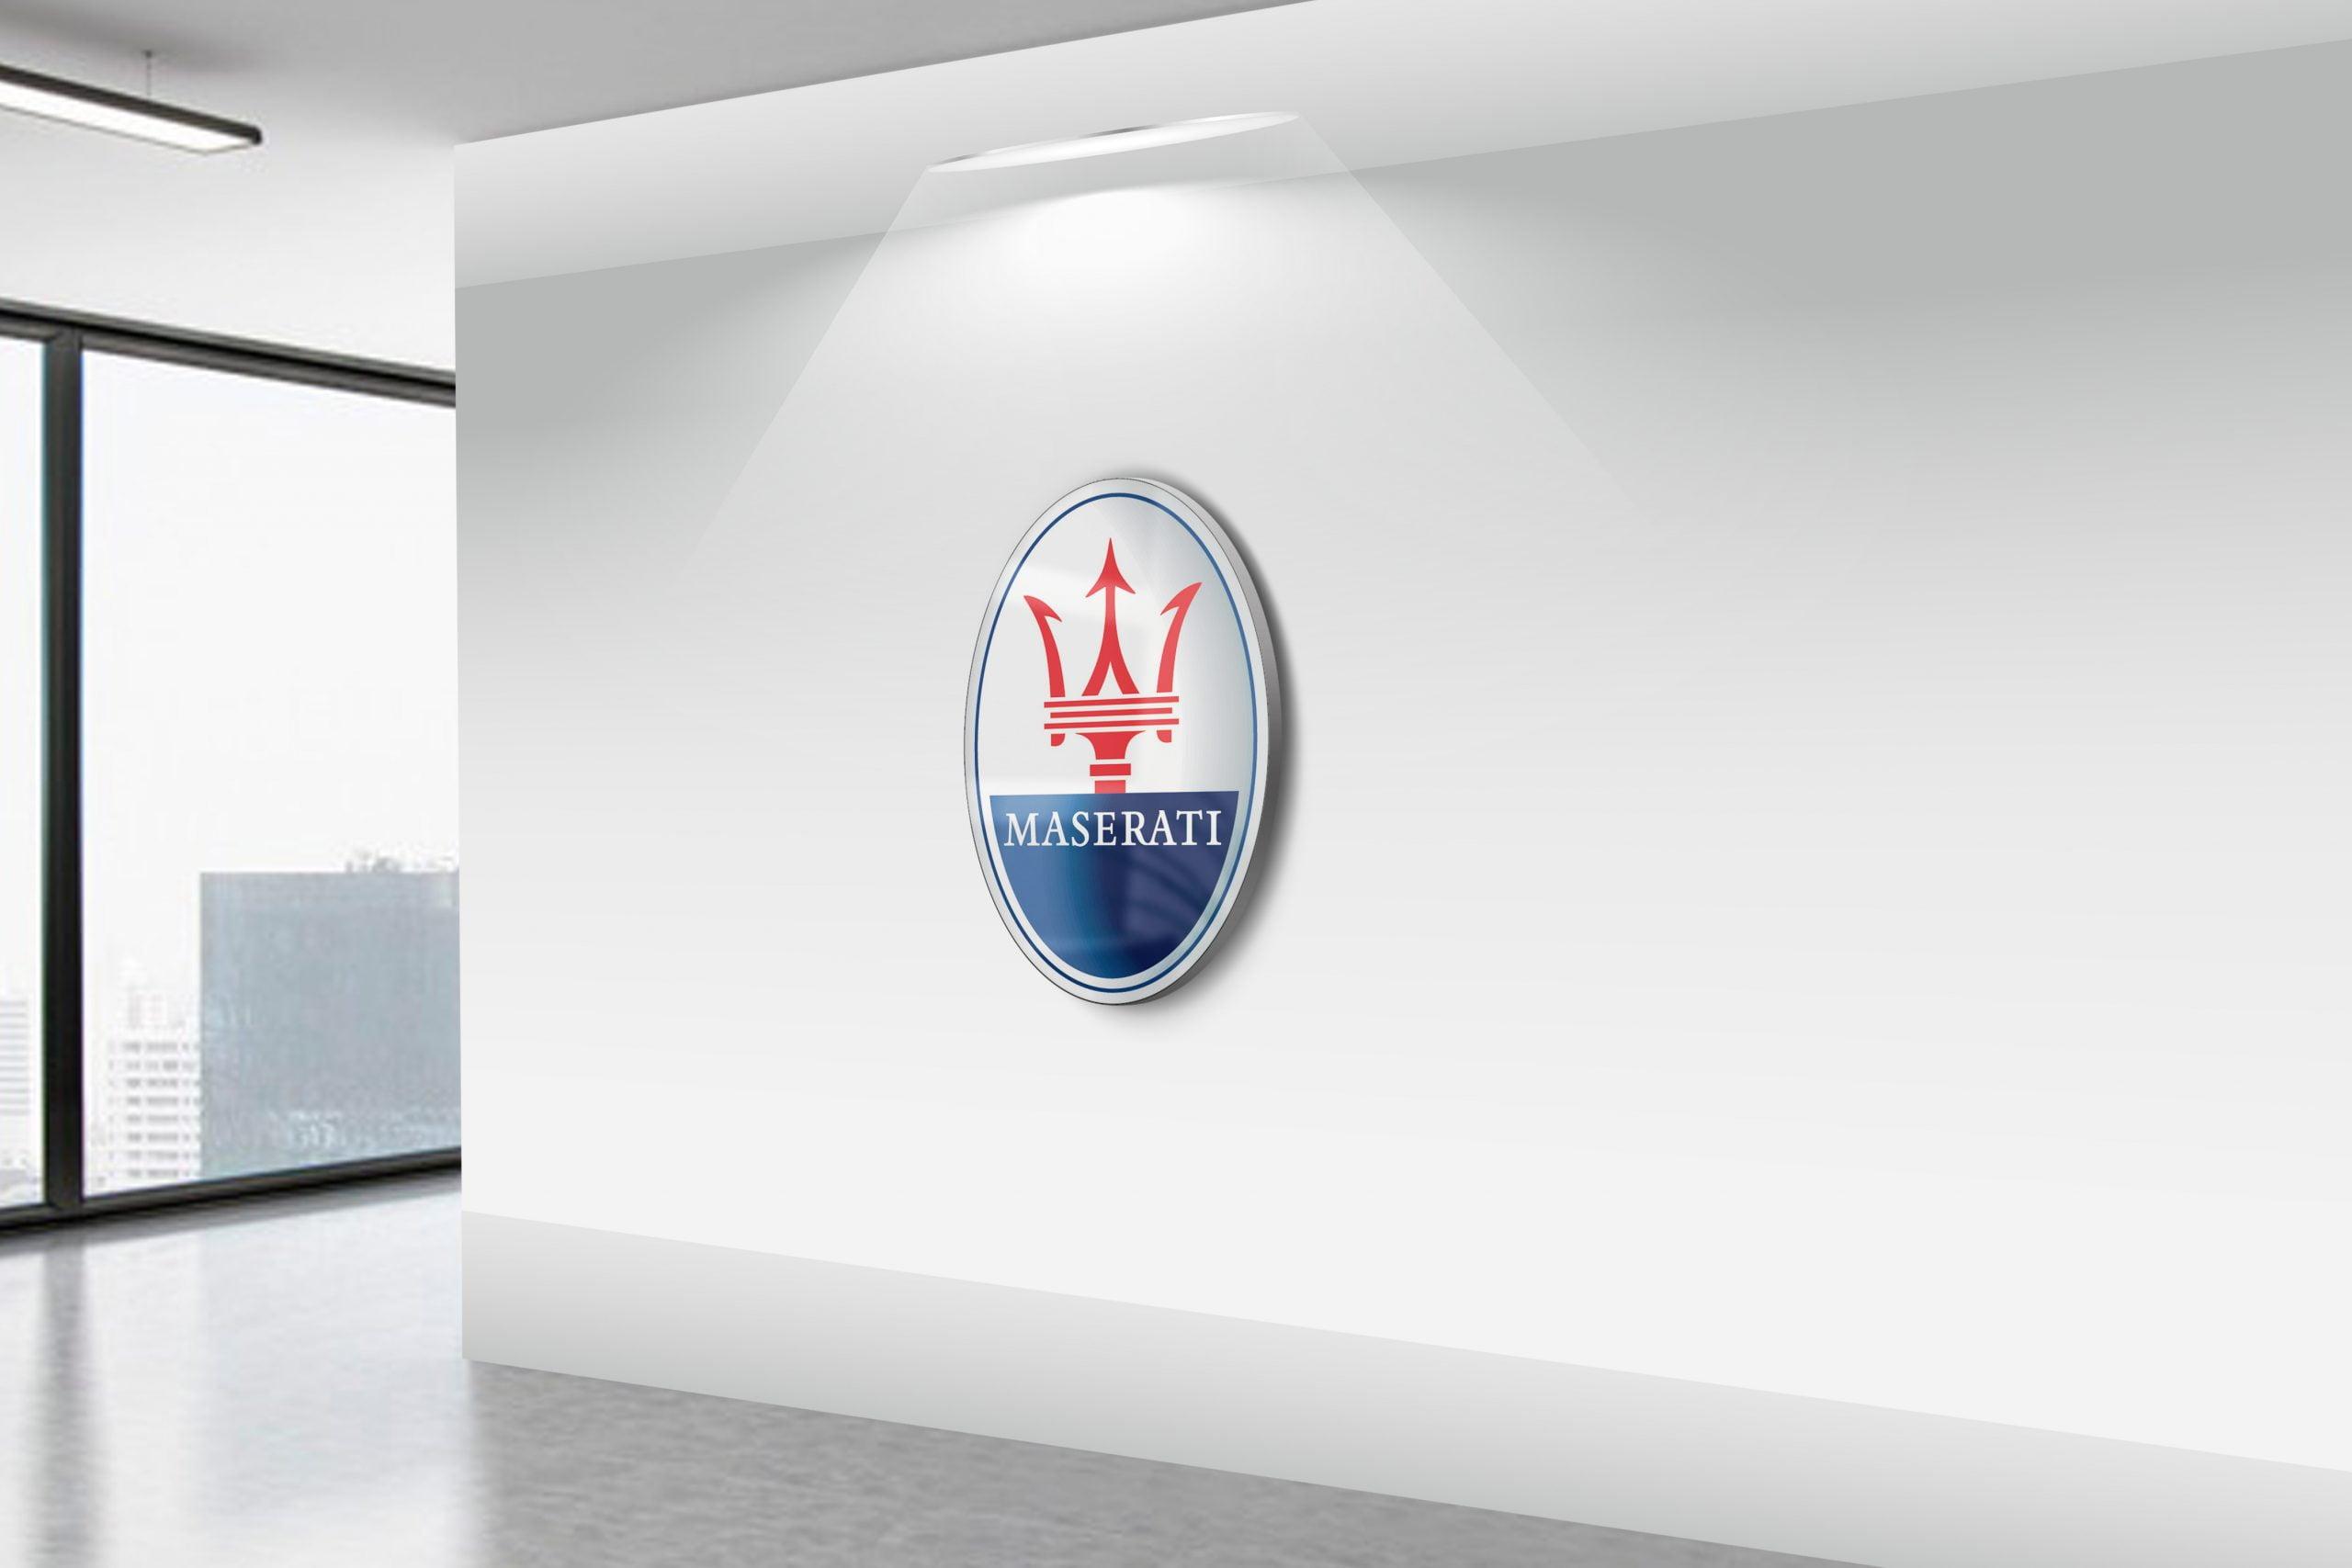 Maserati-Realistic-3D-Wall-Logo-MockUp